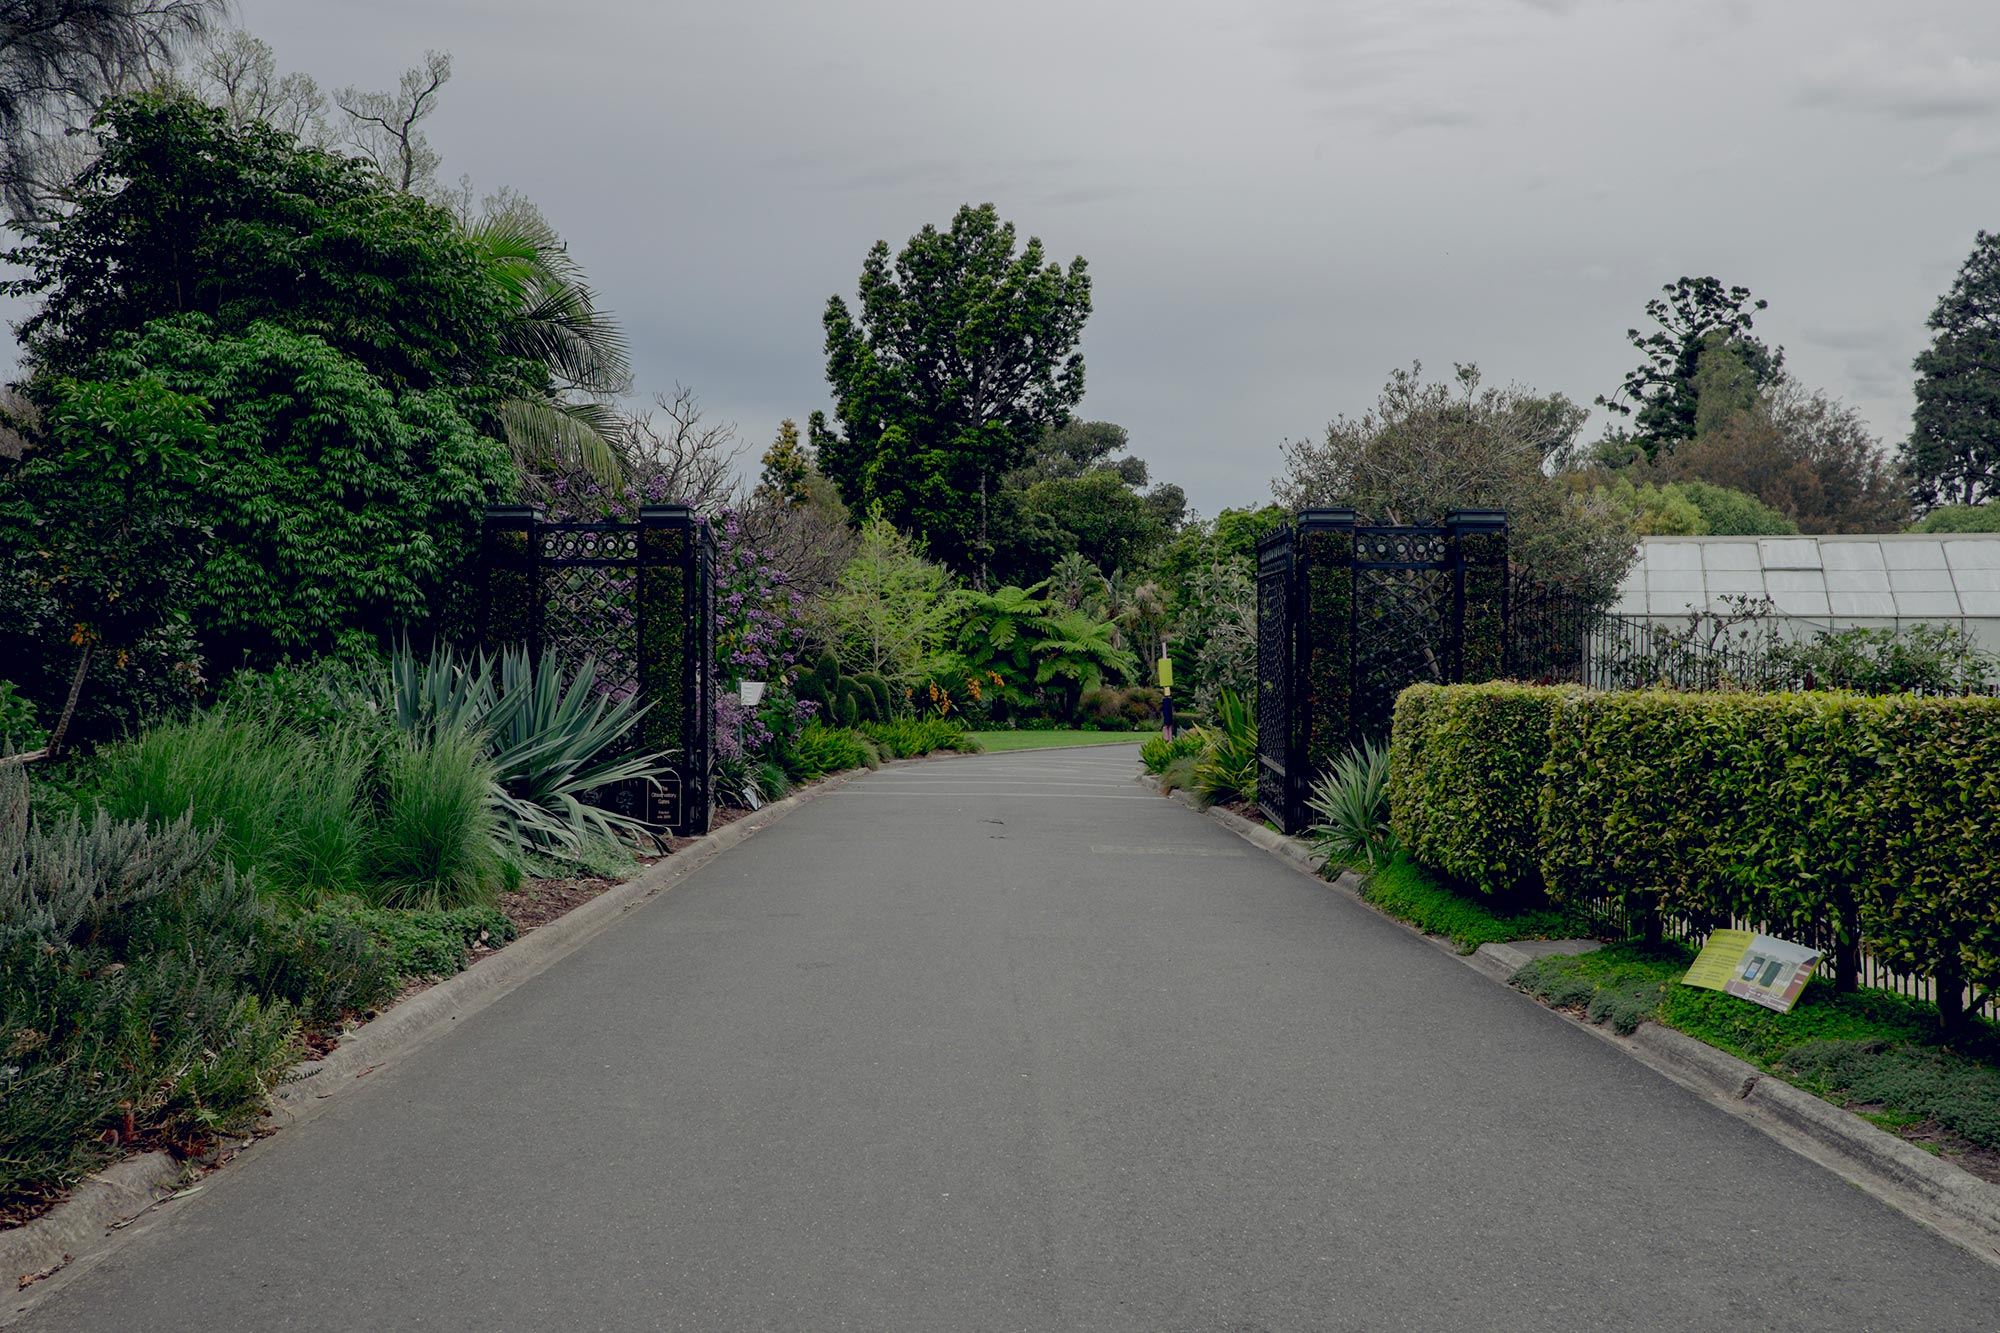 australia-melbourne-royal-botanic-gardens1